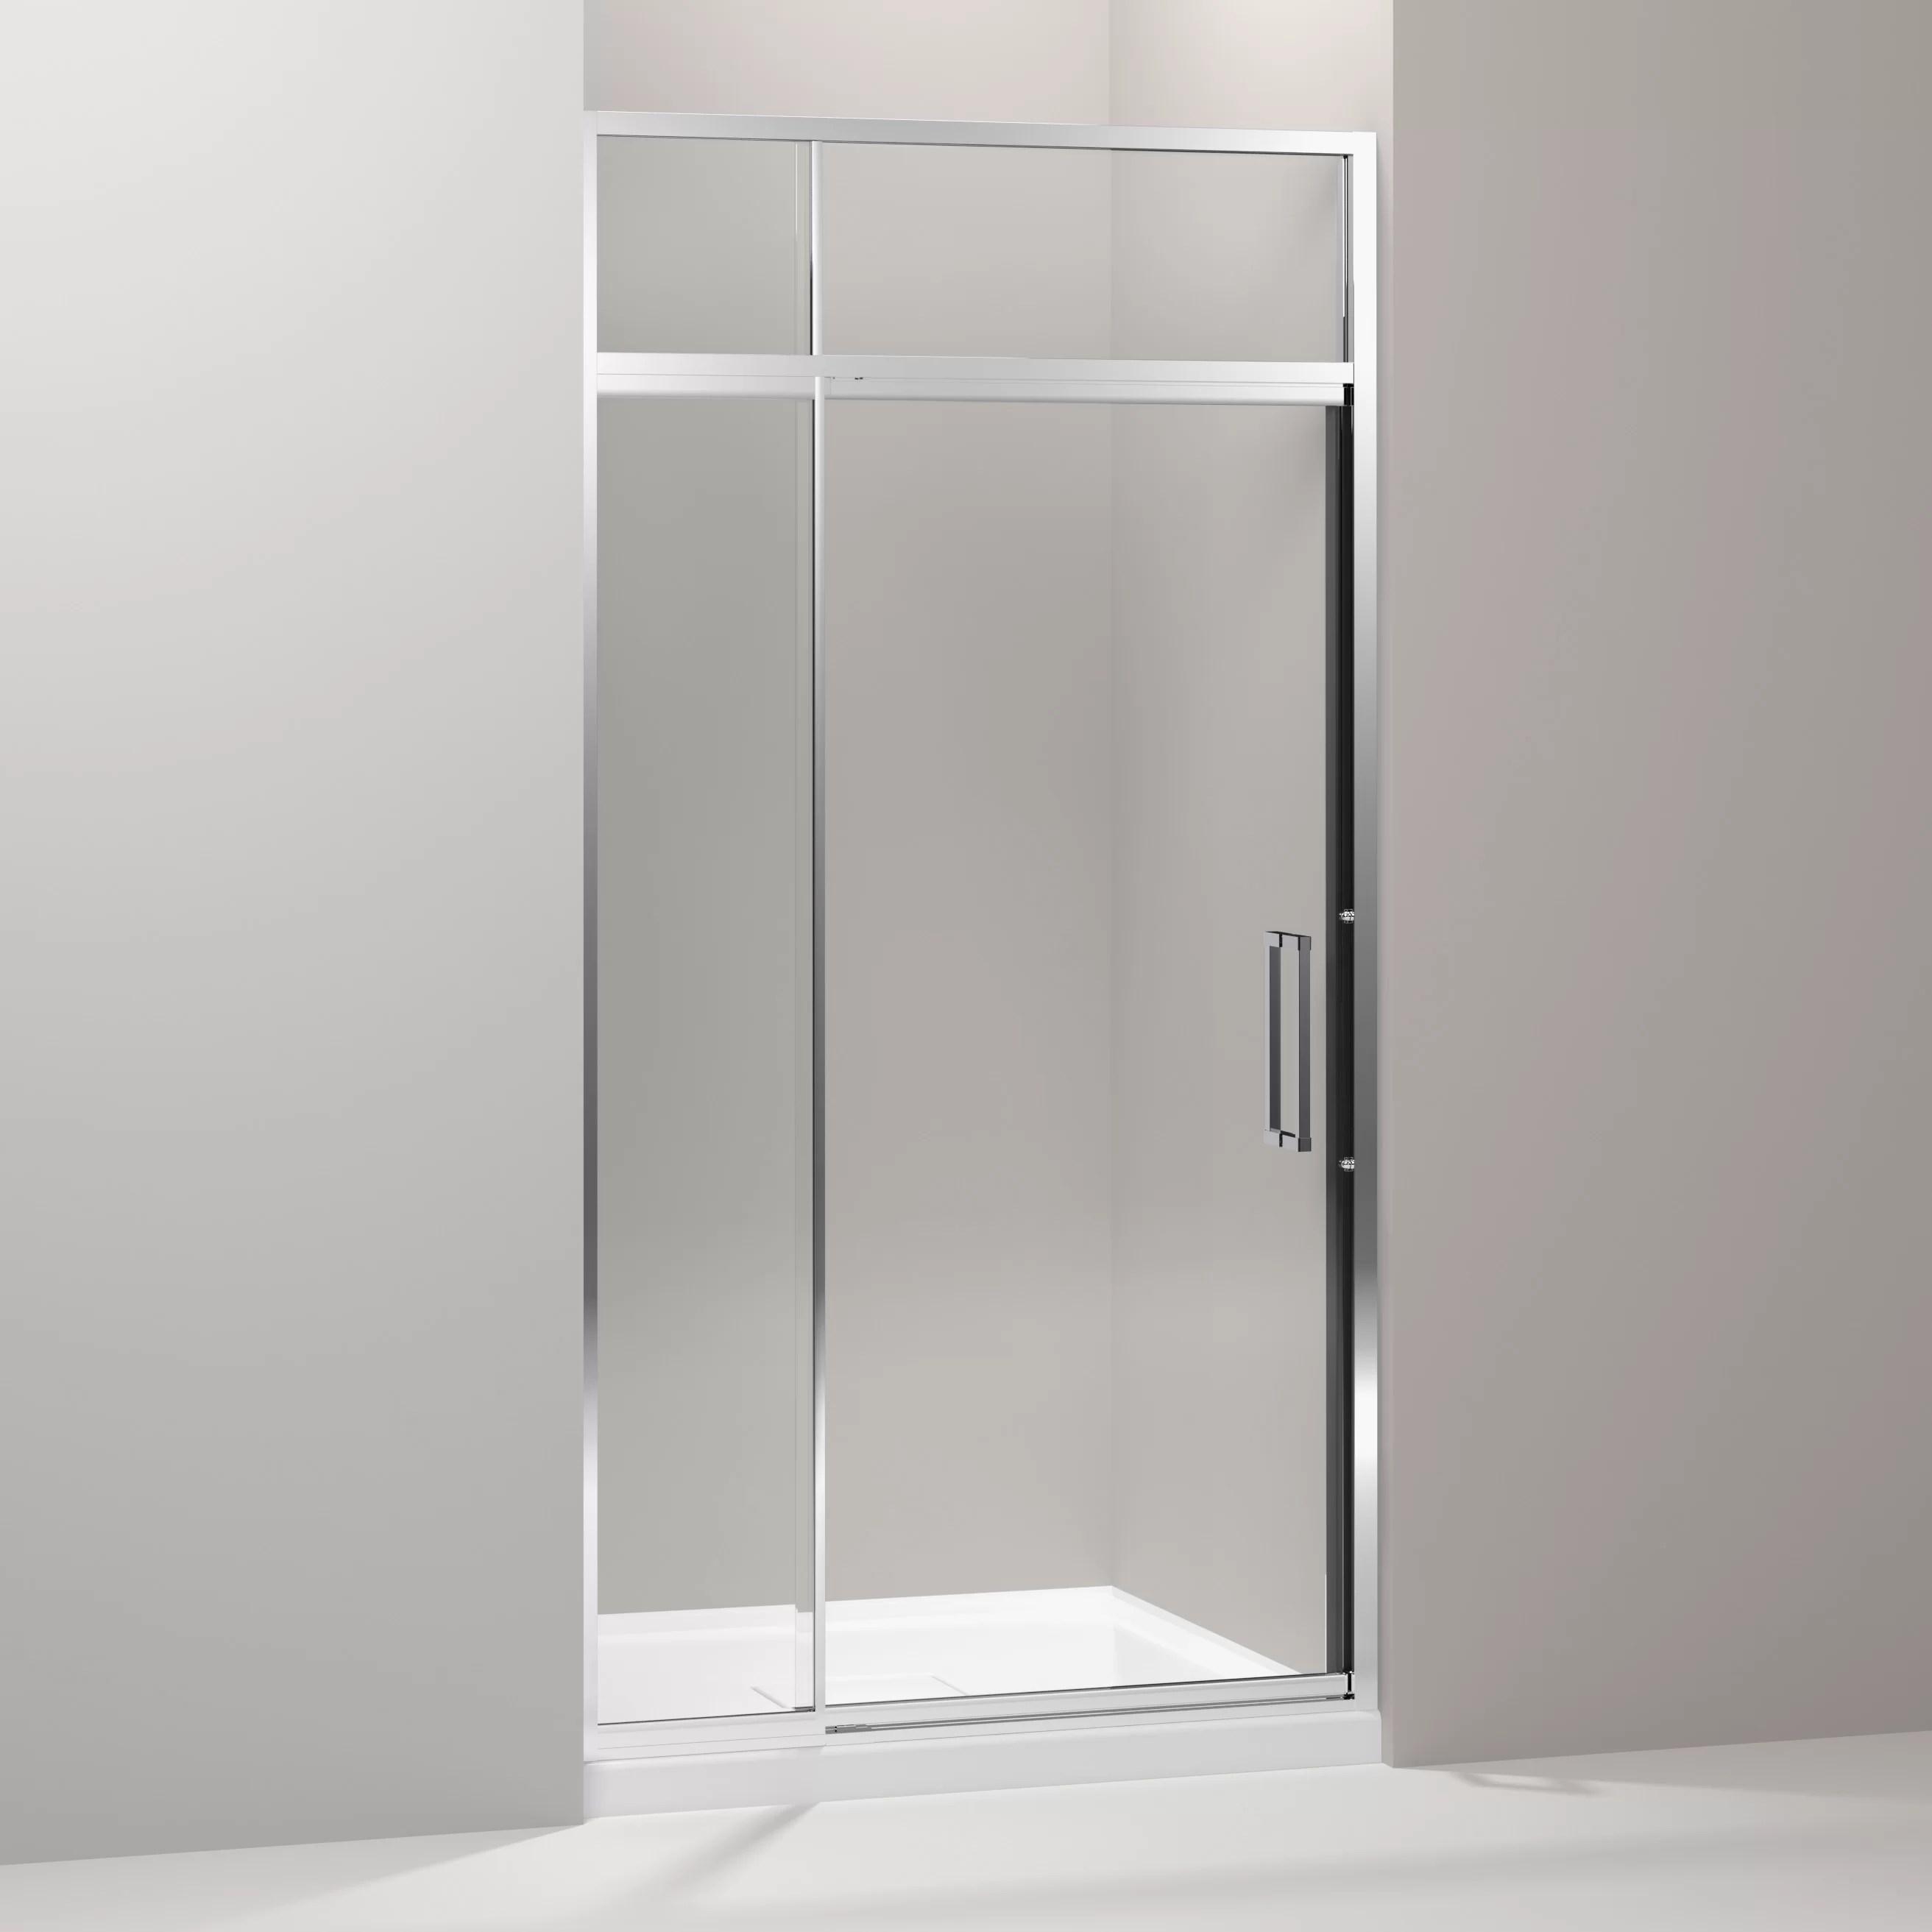 Lattis 42 X 89 5 Pivot Shower Door With Sliding Steam Transom